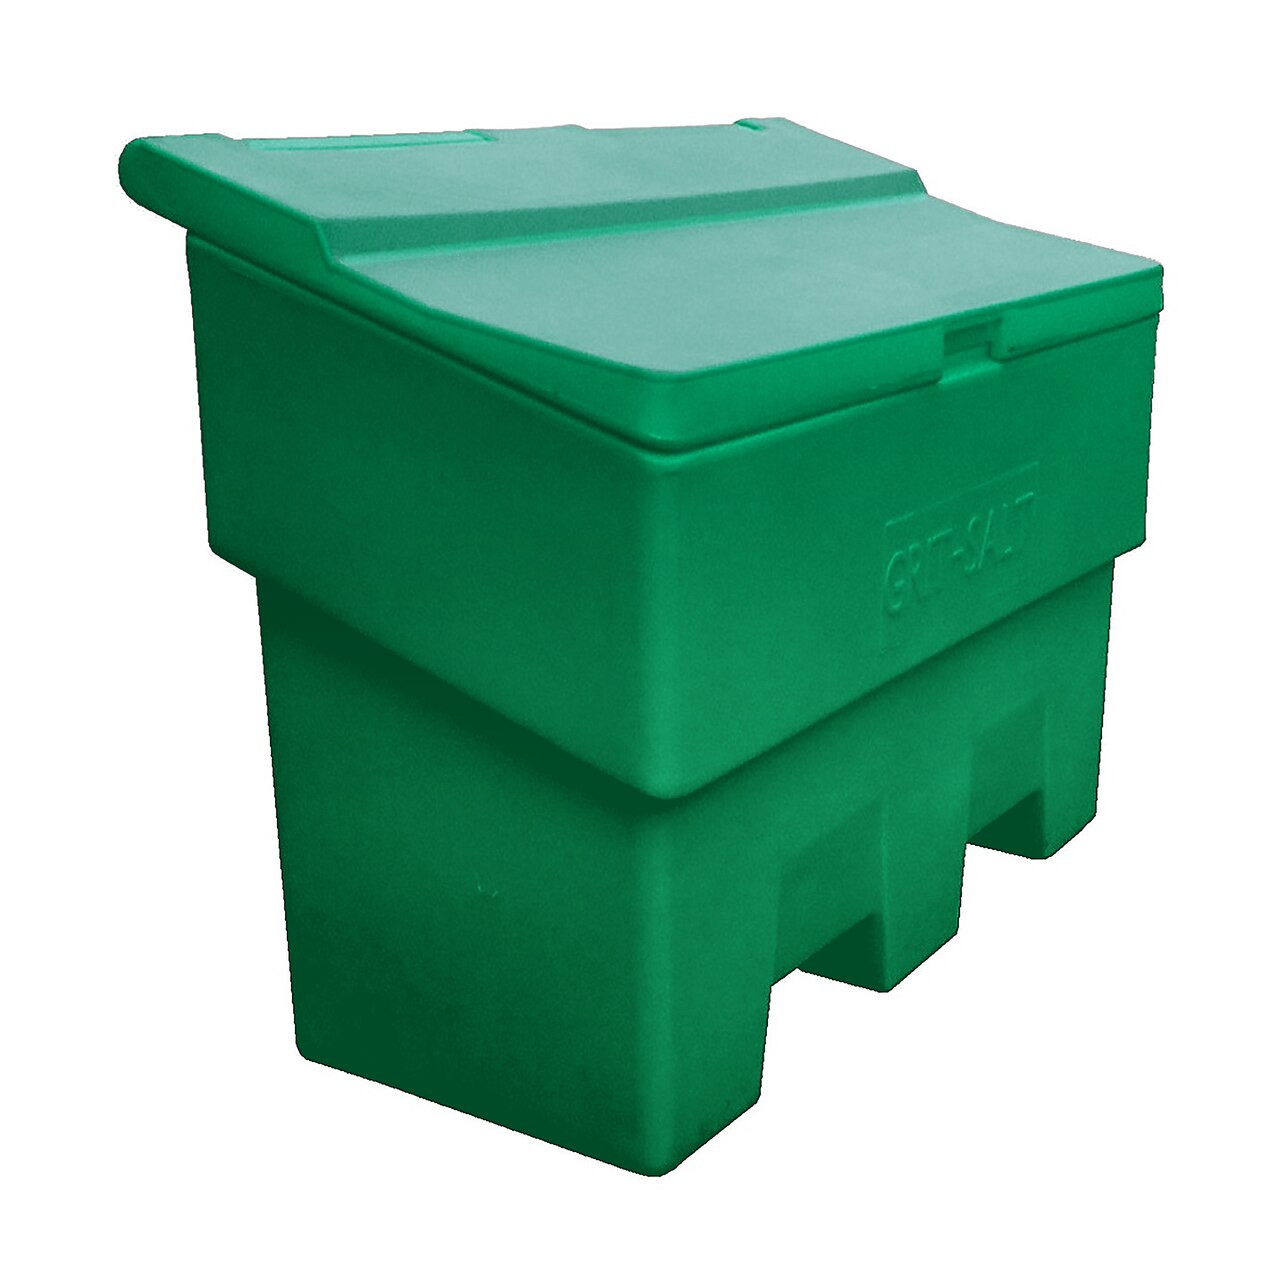 Green 340 Litre grit salt bin box